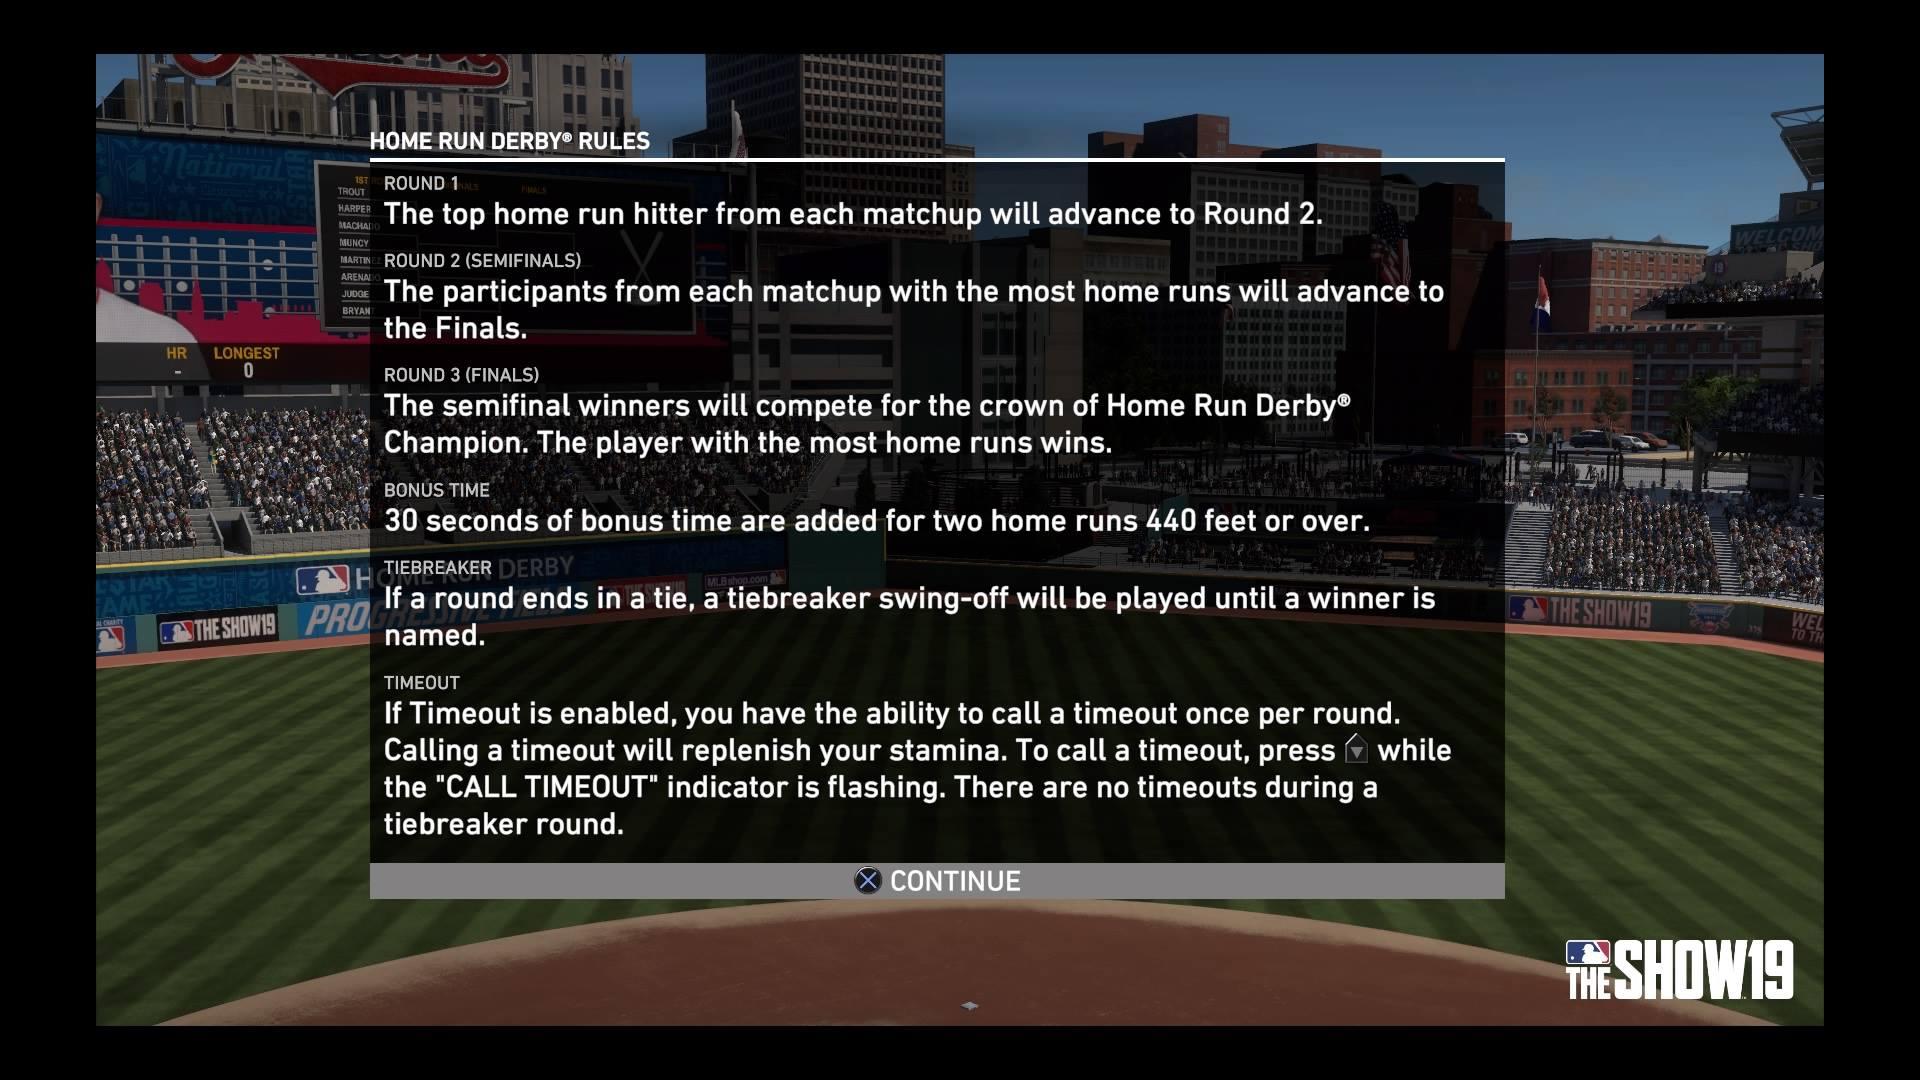 Home Run Rules